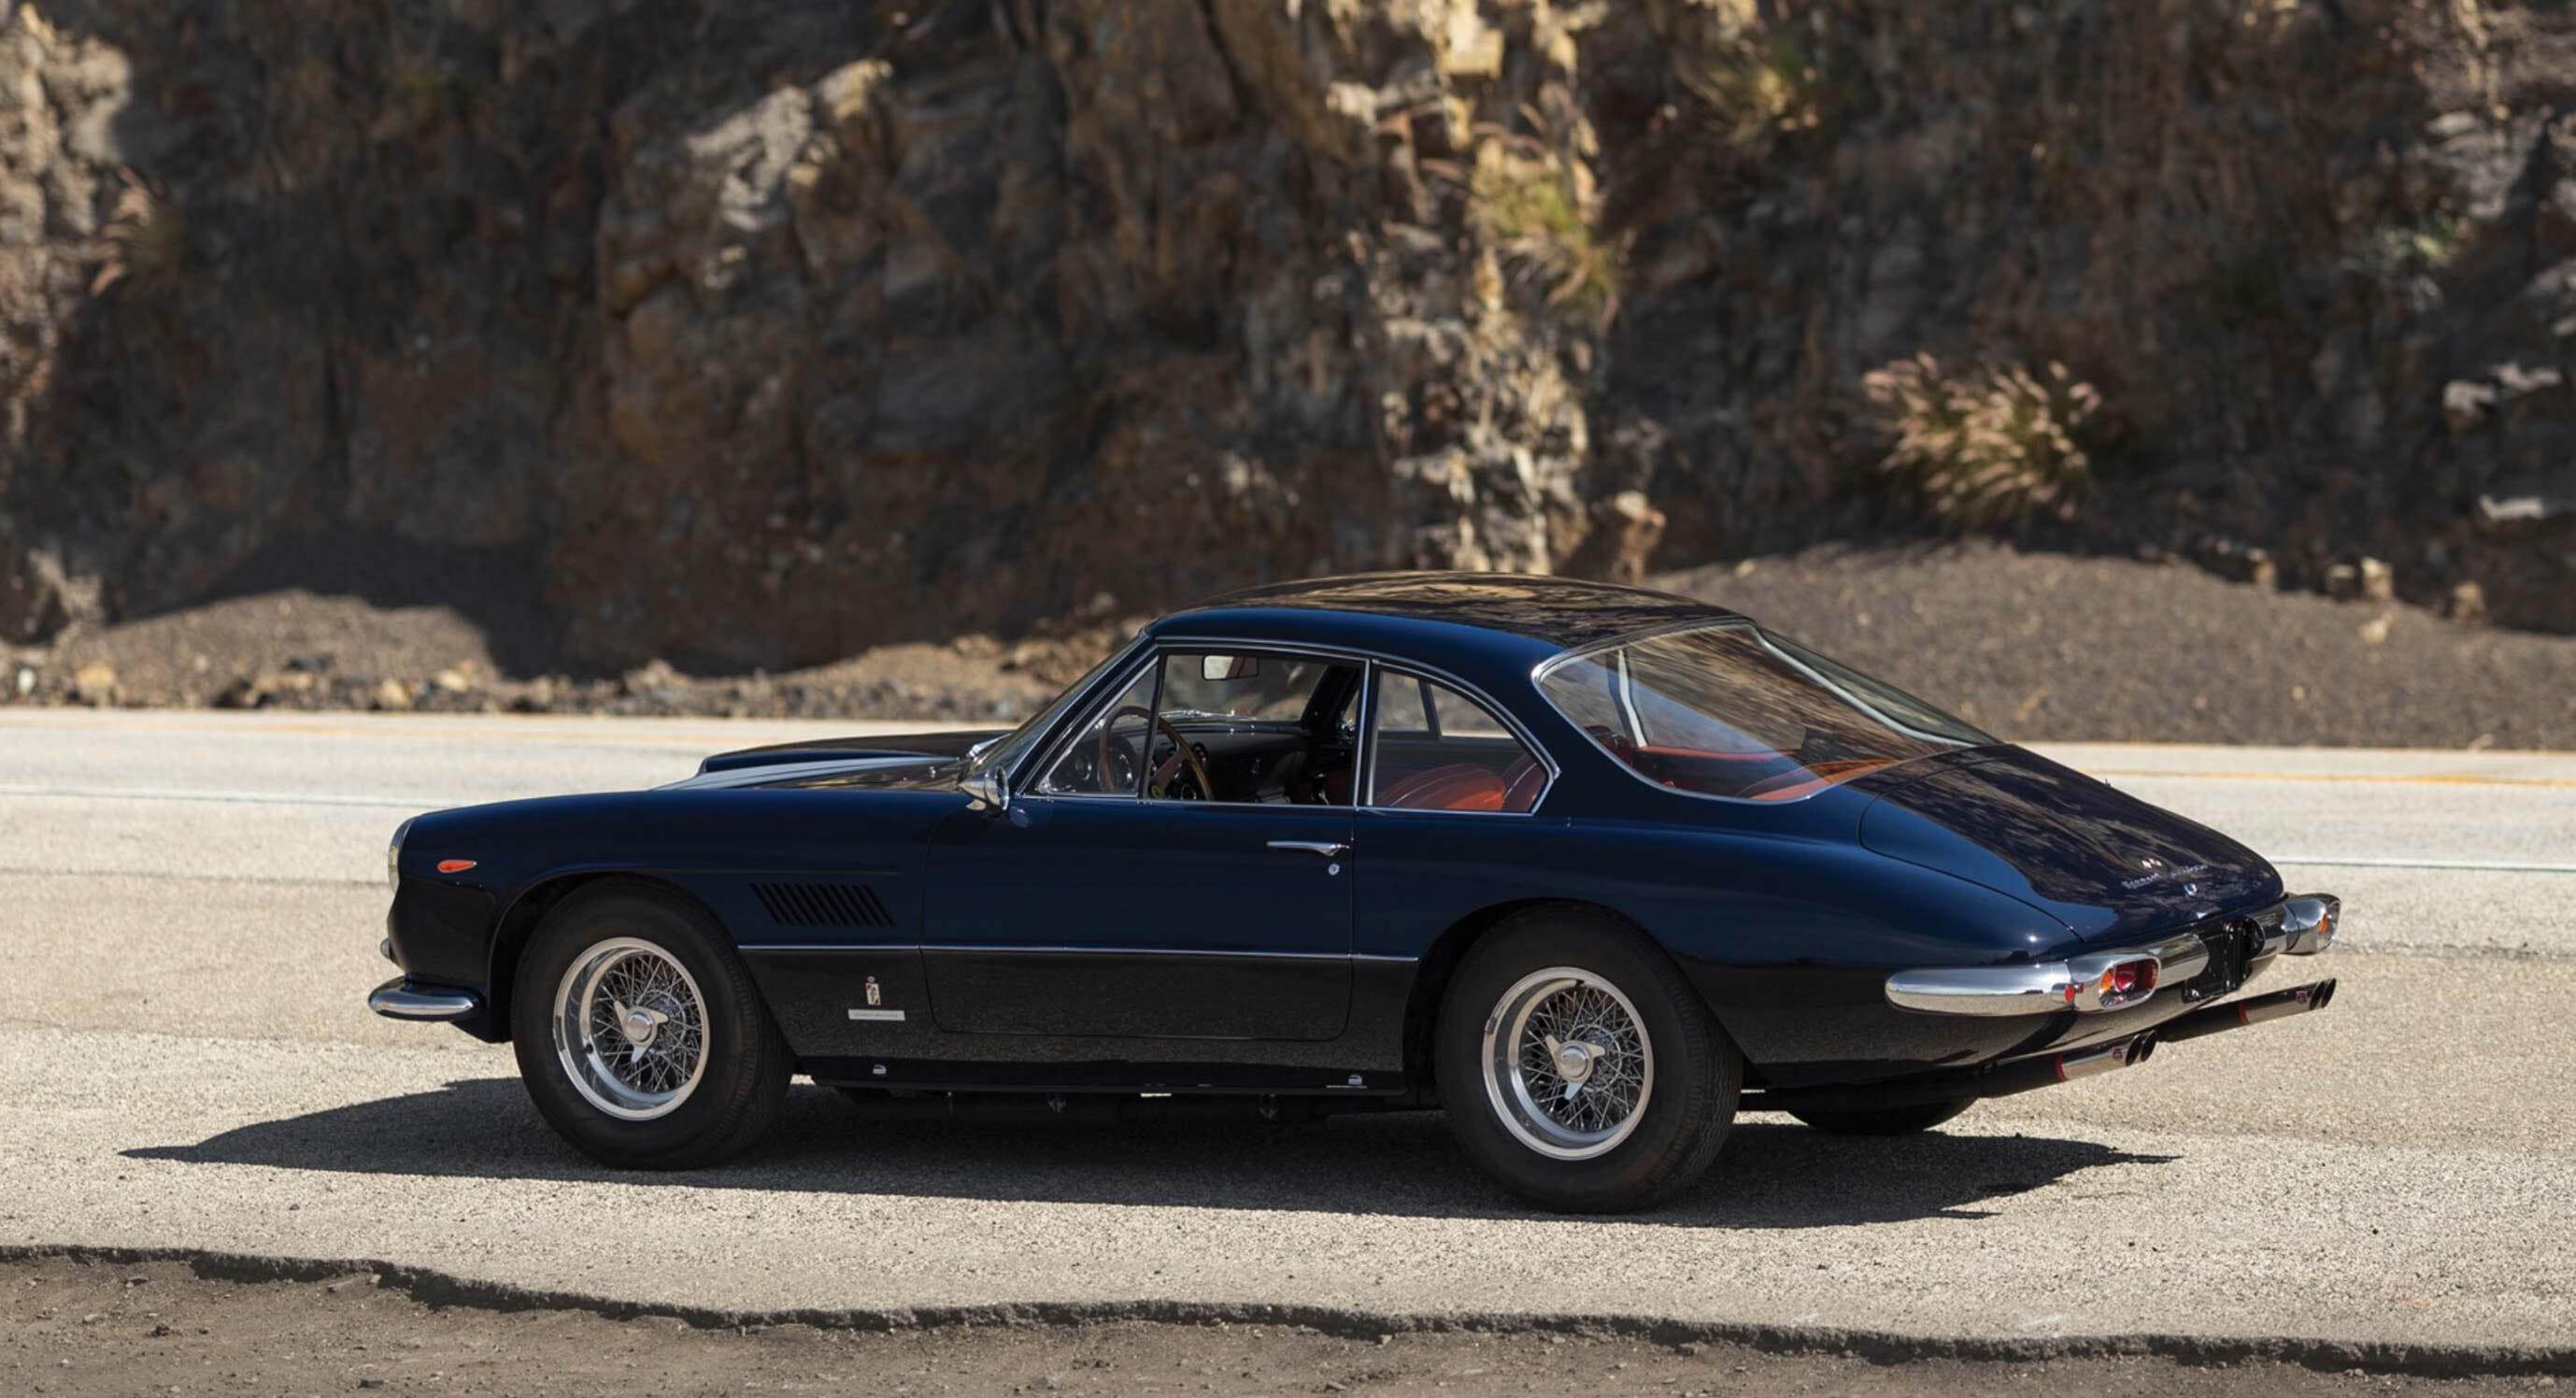 This 1961 Ferrari 400 Superamerica SWB Coupe Aerodinamico Is Fit For Royalty